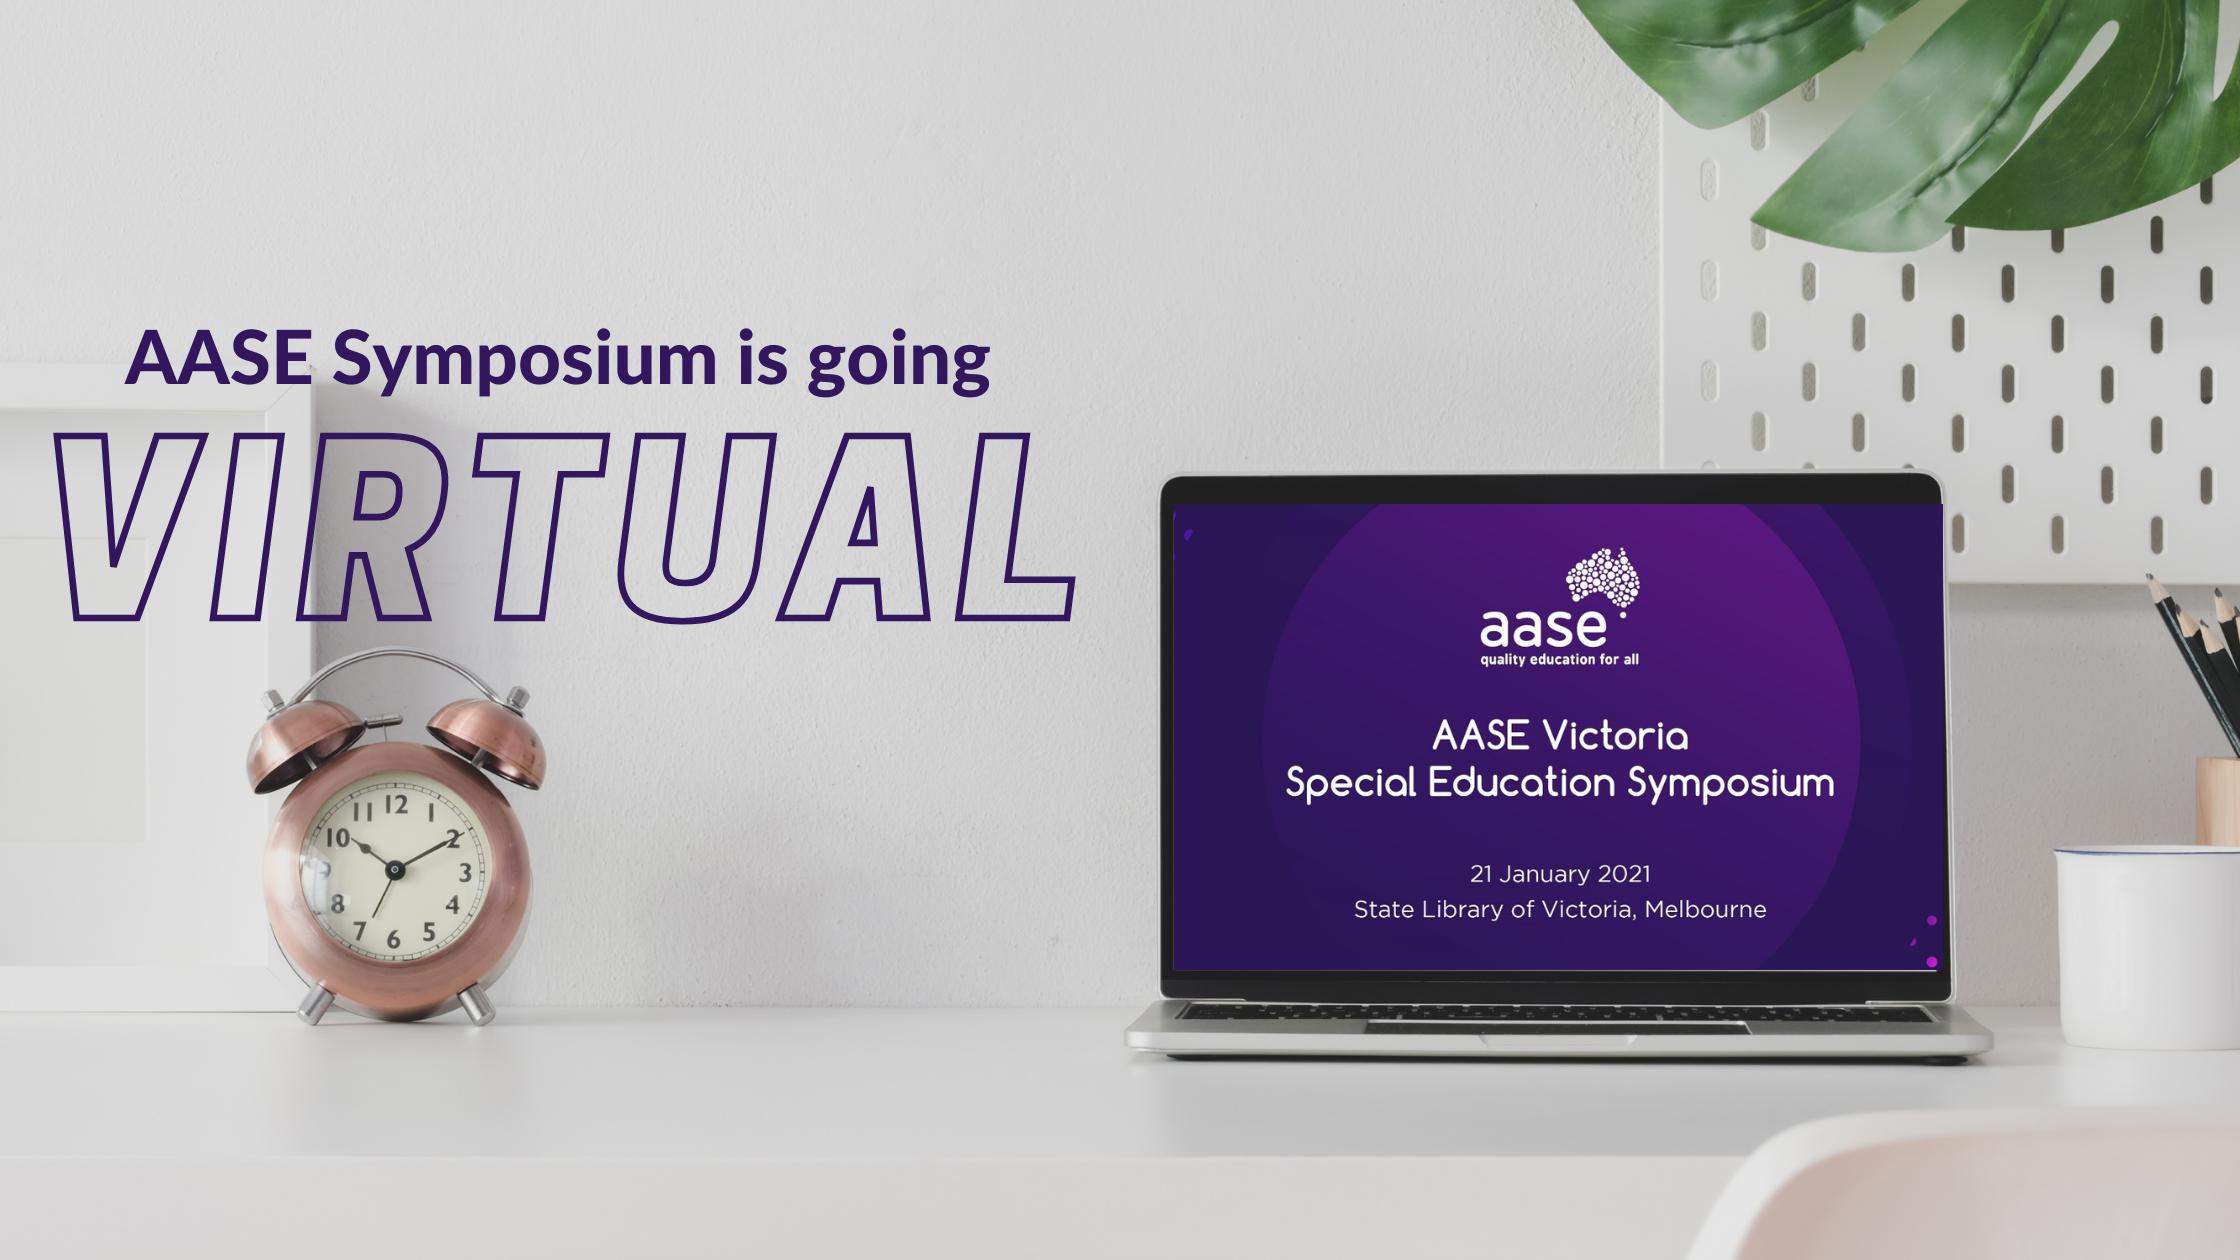 AASE Victoria Symposium